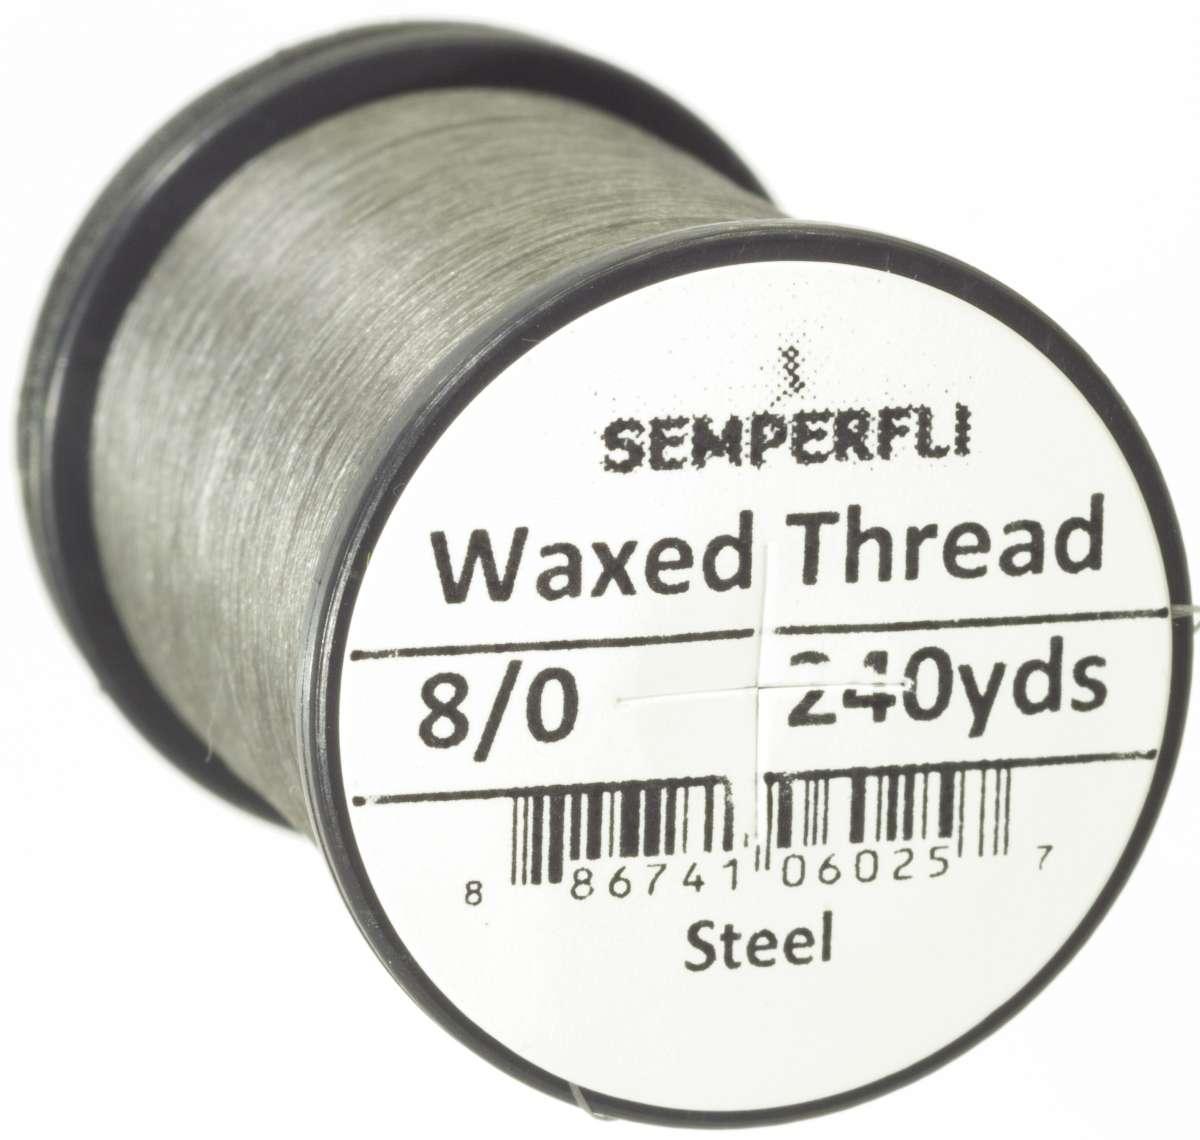 8/0 Classic Waxed Thread Steel Sem-0400-1504